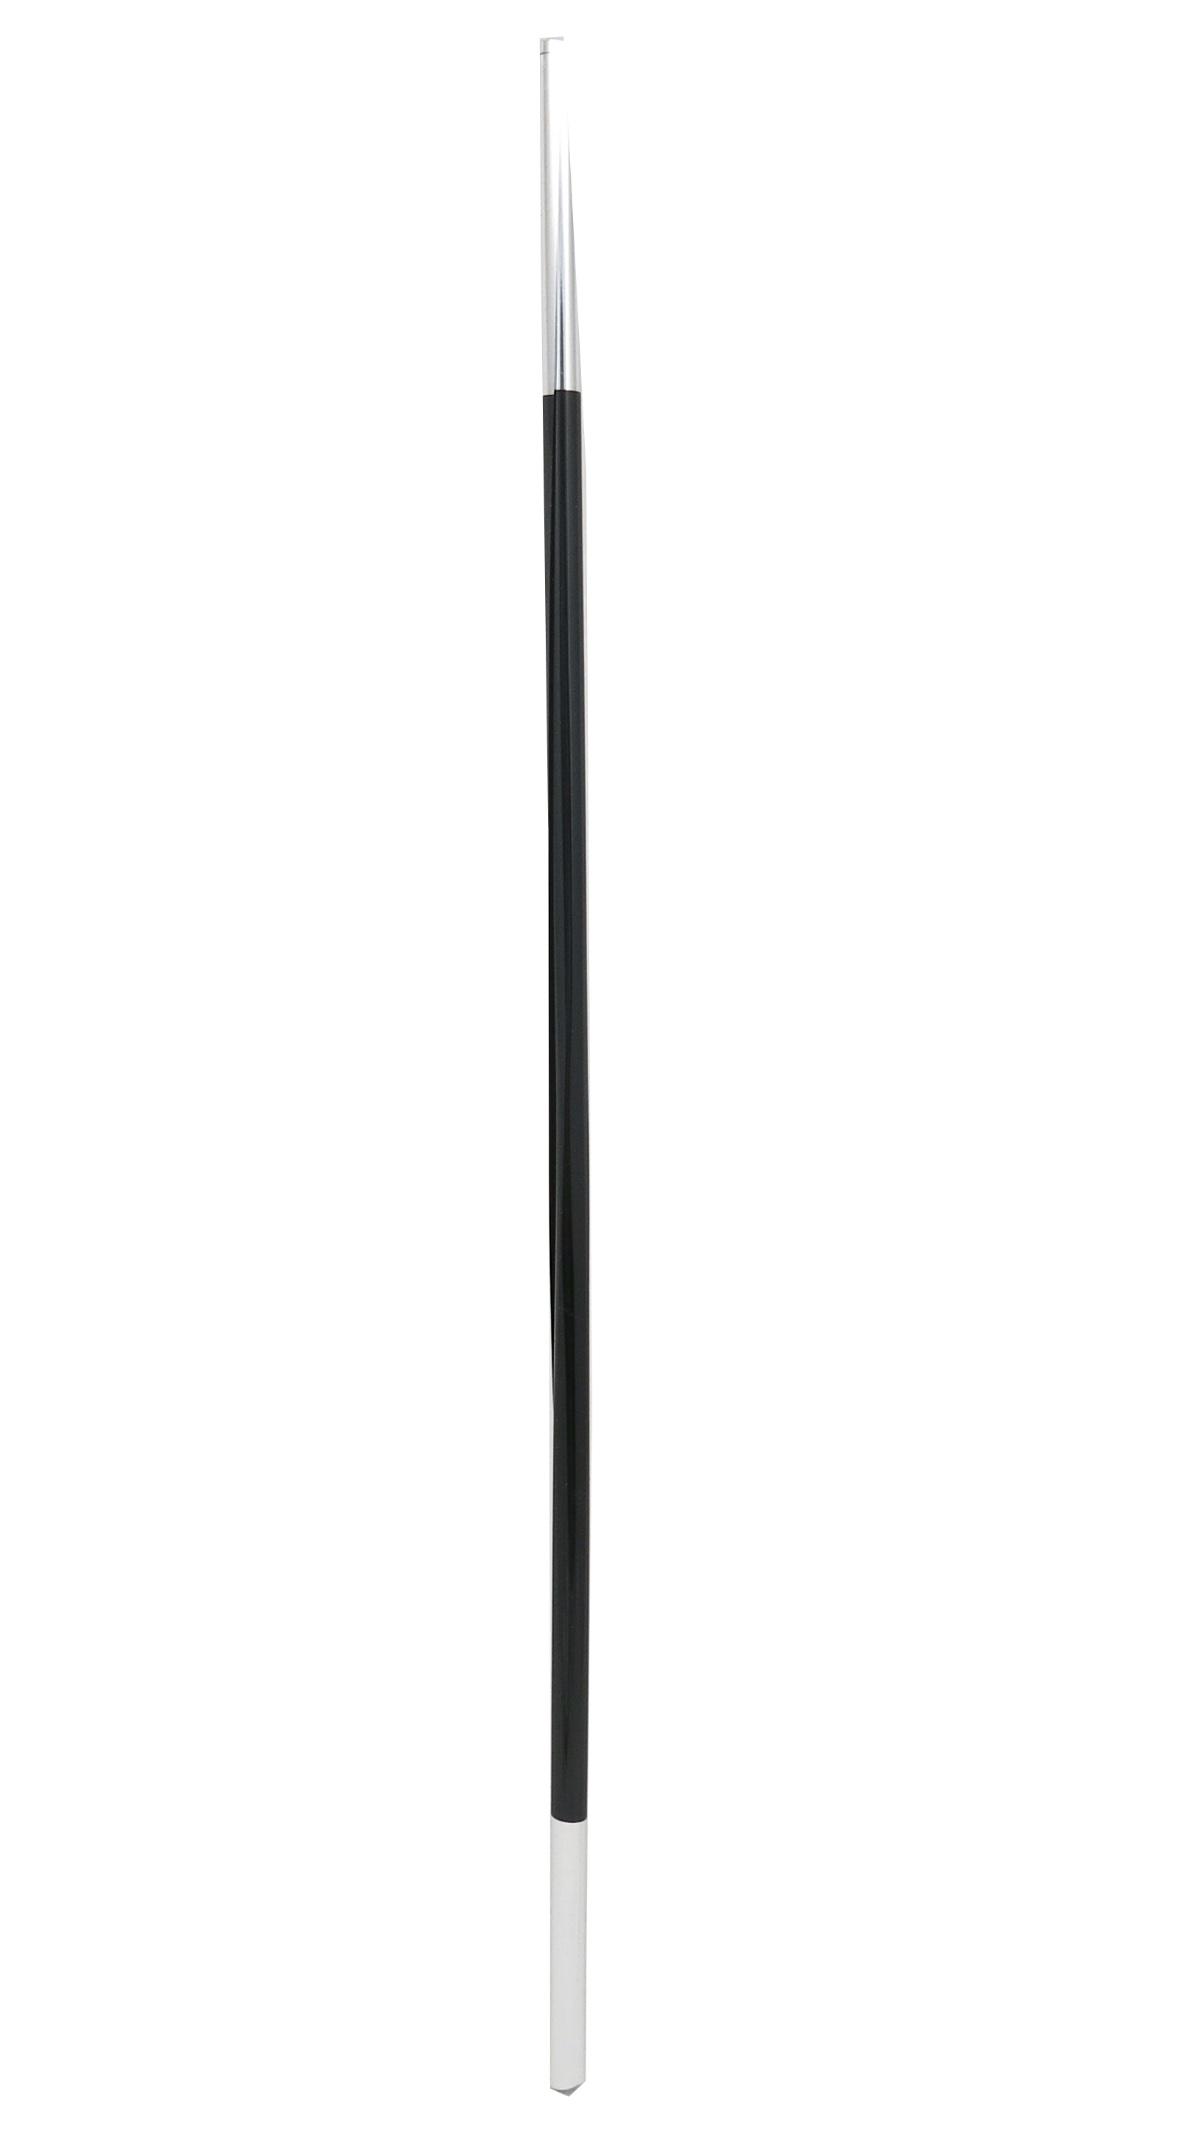 Instant Appearing 18 inch Magic Wand Black, Pack of 2 Rock Ridge Magic